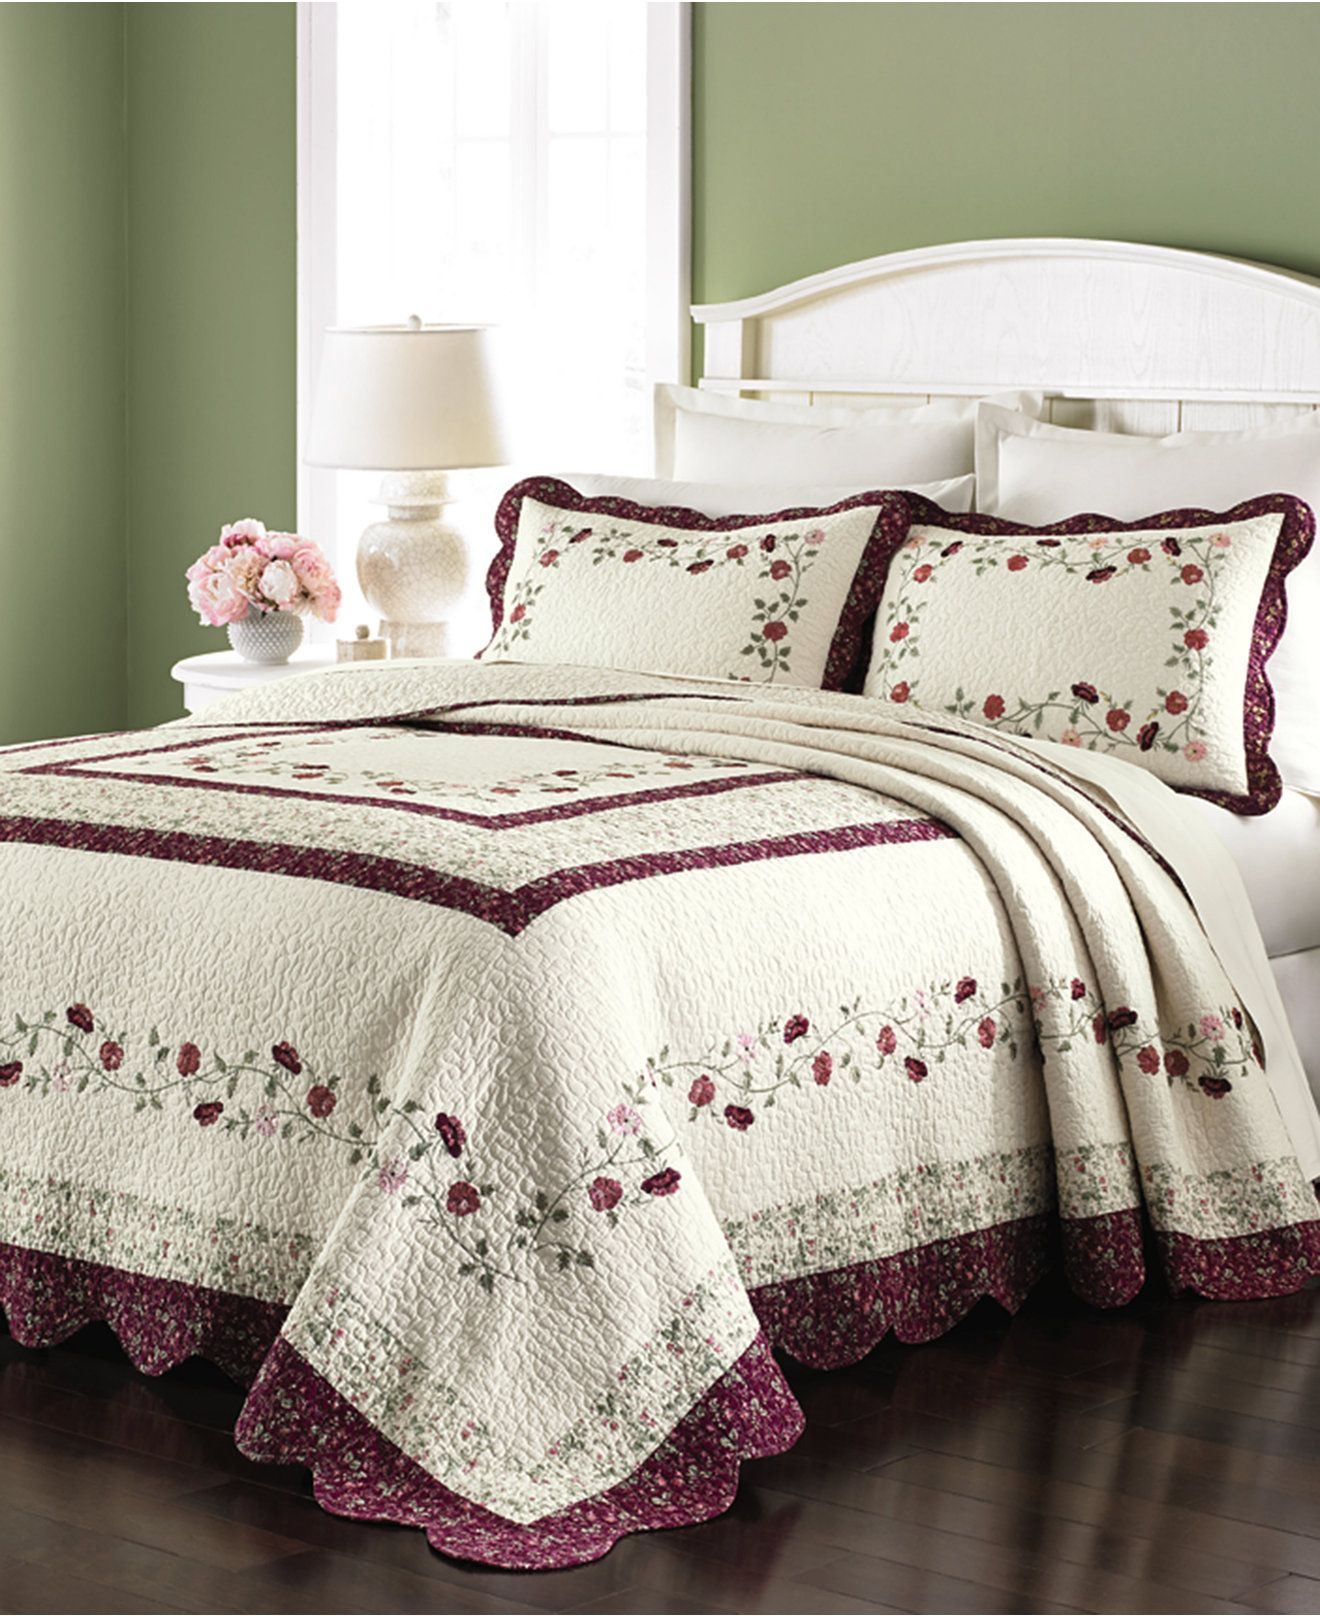 Martha Stewart Collection Prairie House Bedspreads - Quilts ... : macys bedding quilts - Adamdwight.com